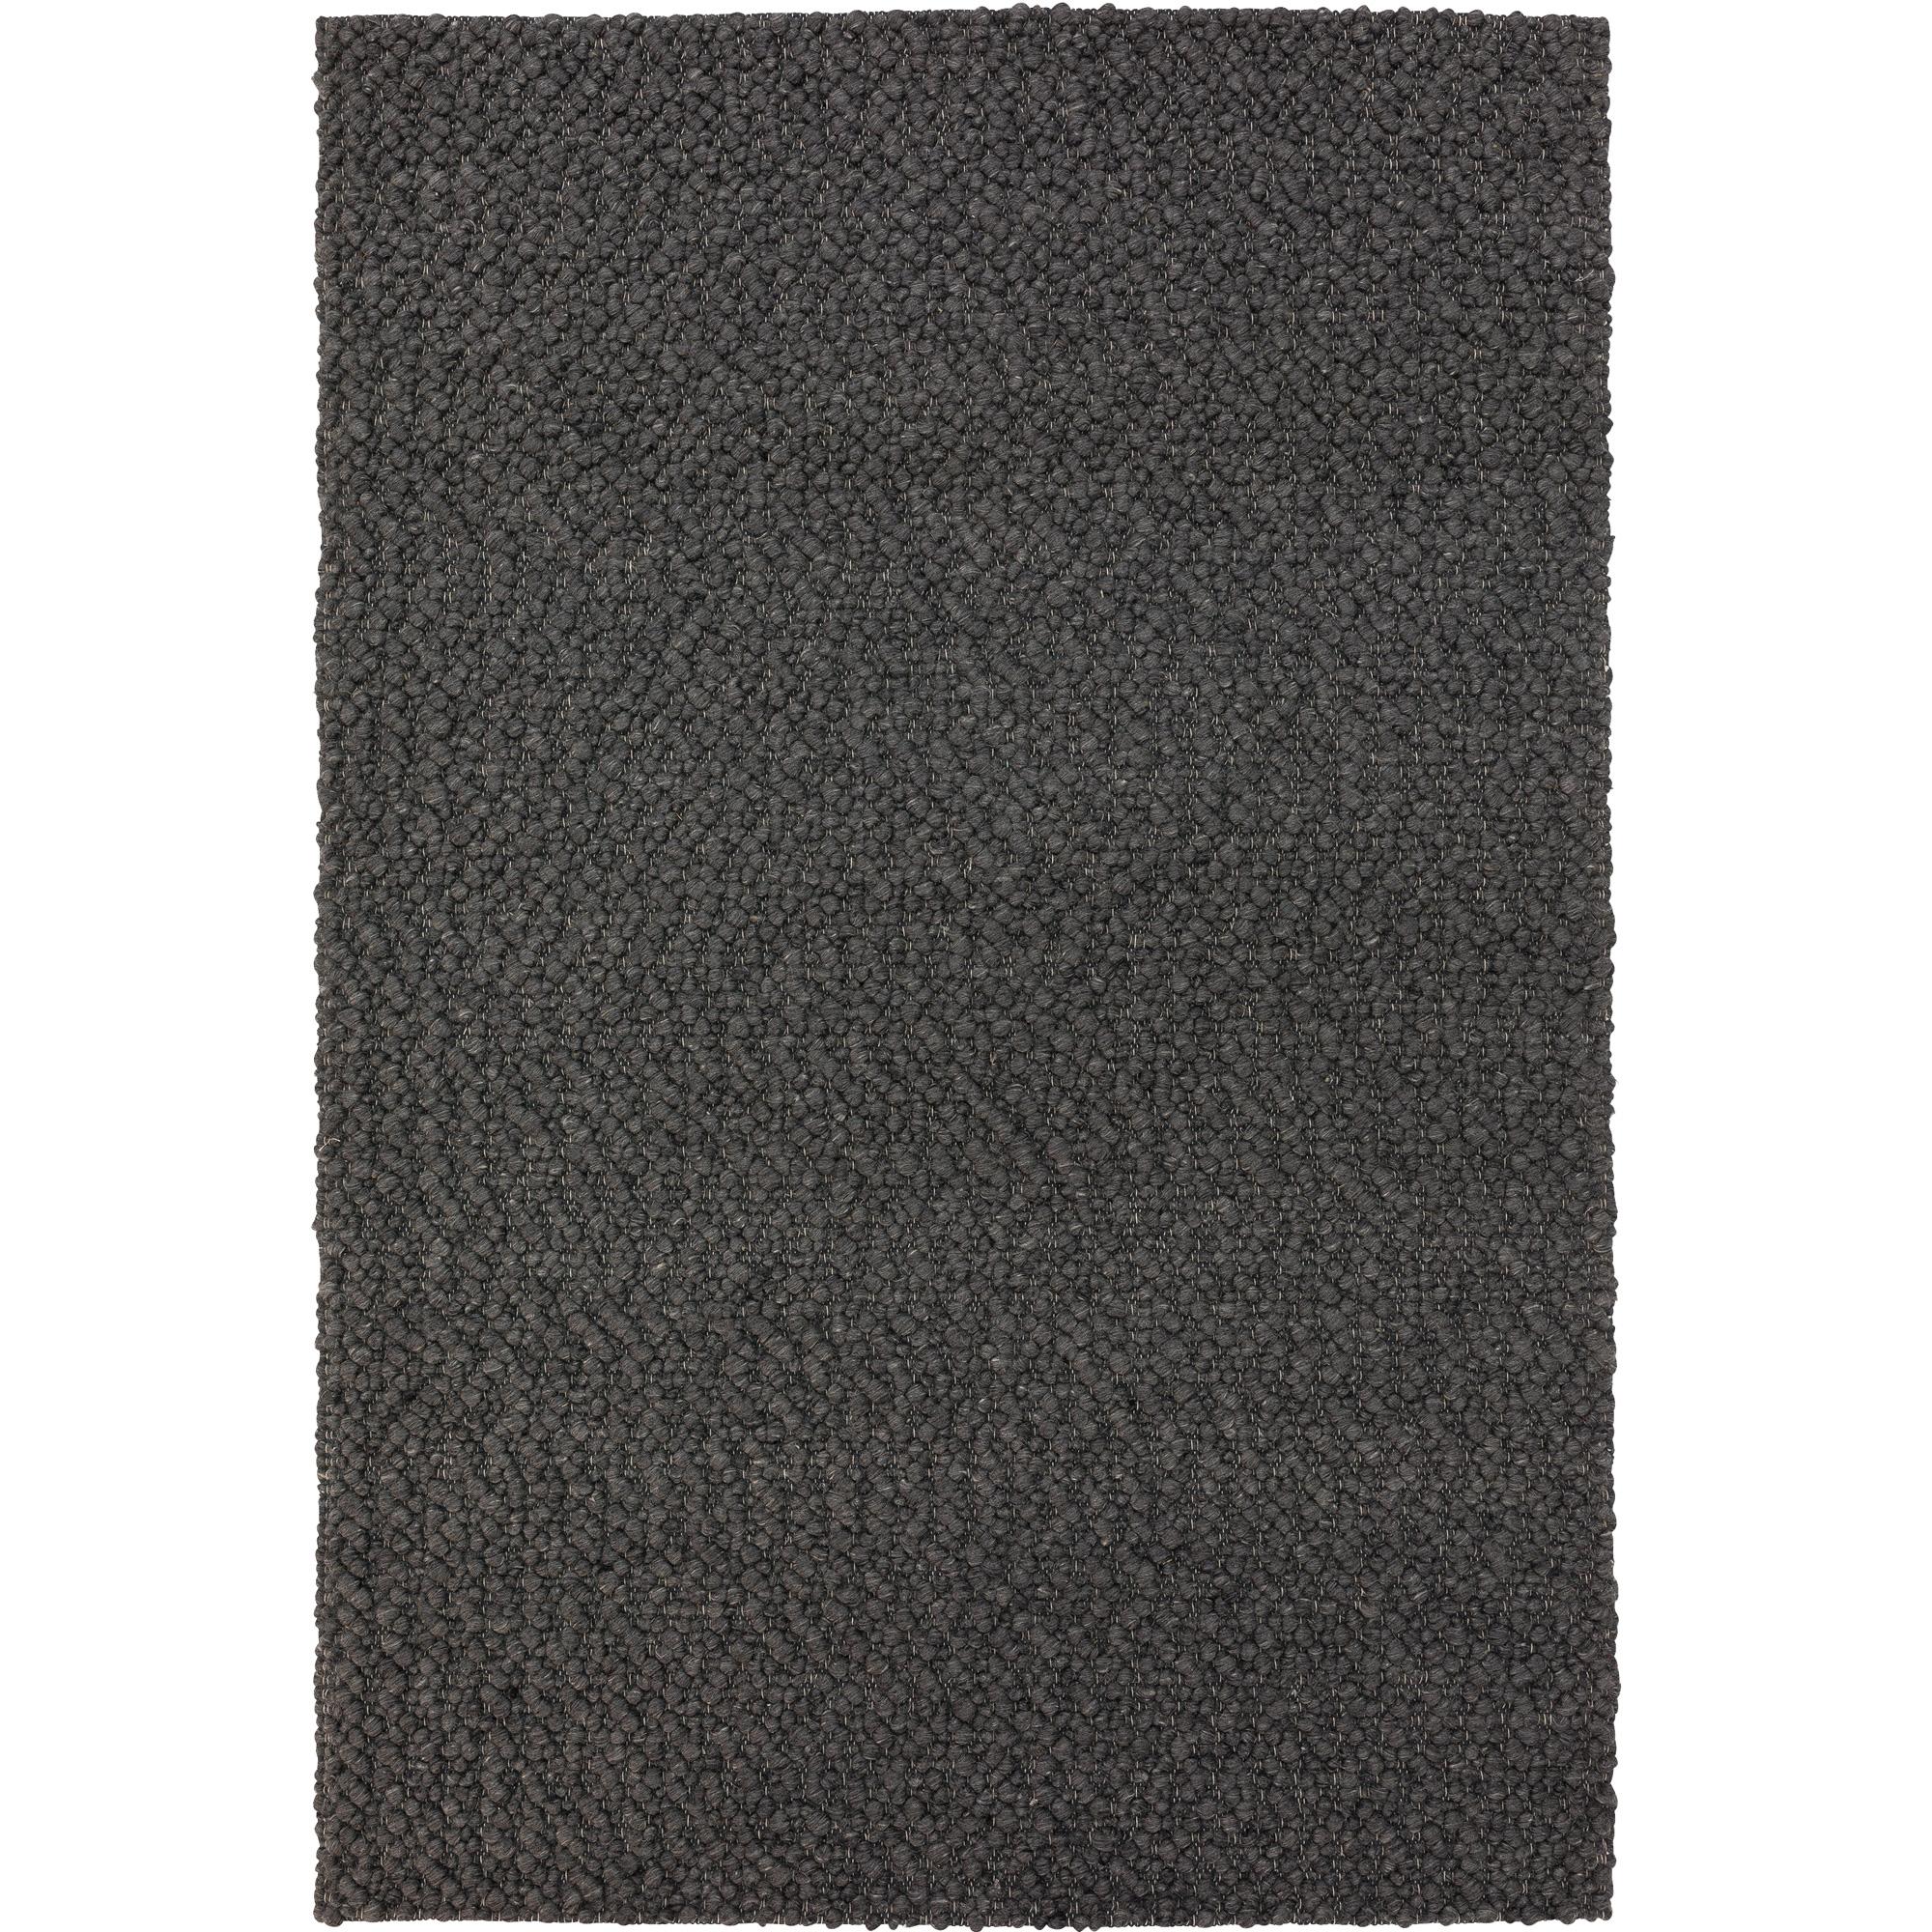 Dalyn Rug Company | Gorbea Charcoal 8x10 Area Rug